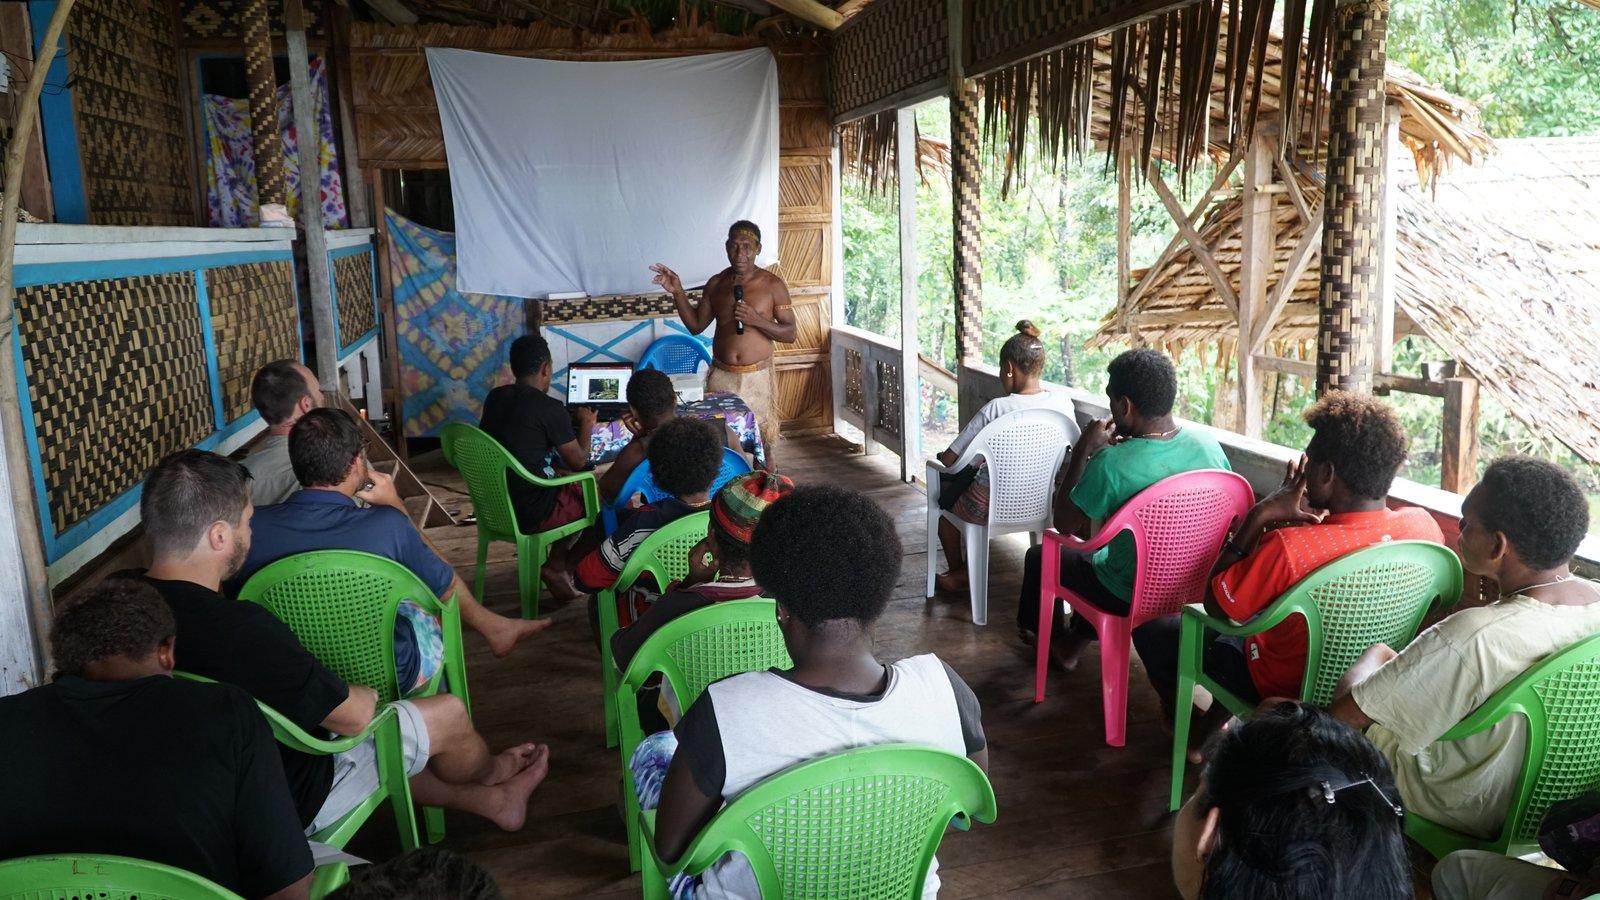 Chief Esau, a local community leader, presents during the Gala workshop.